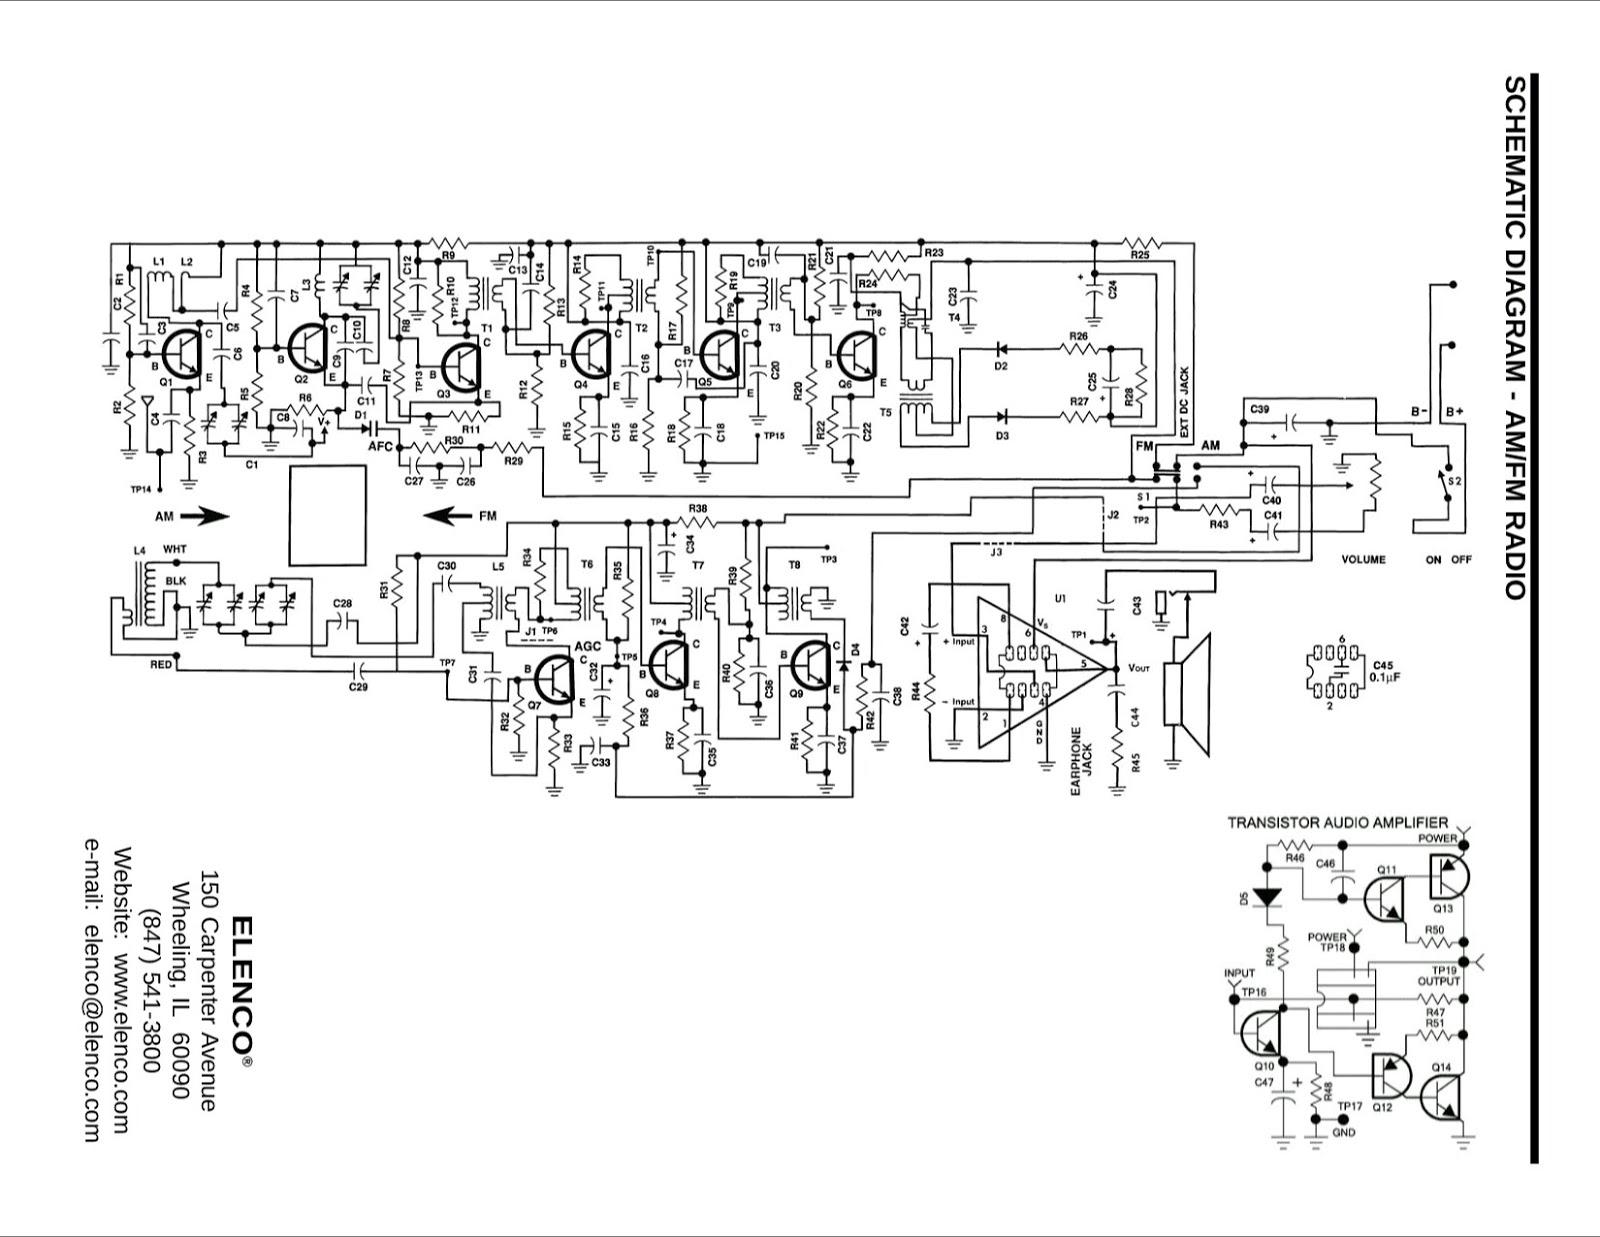 simple fm receiver circuit diagram [ 1600 x 1237 Pixel ]